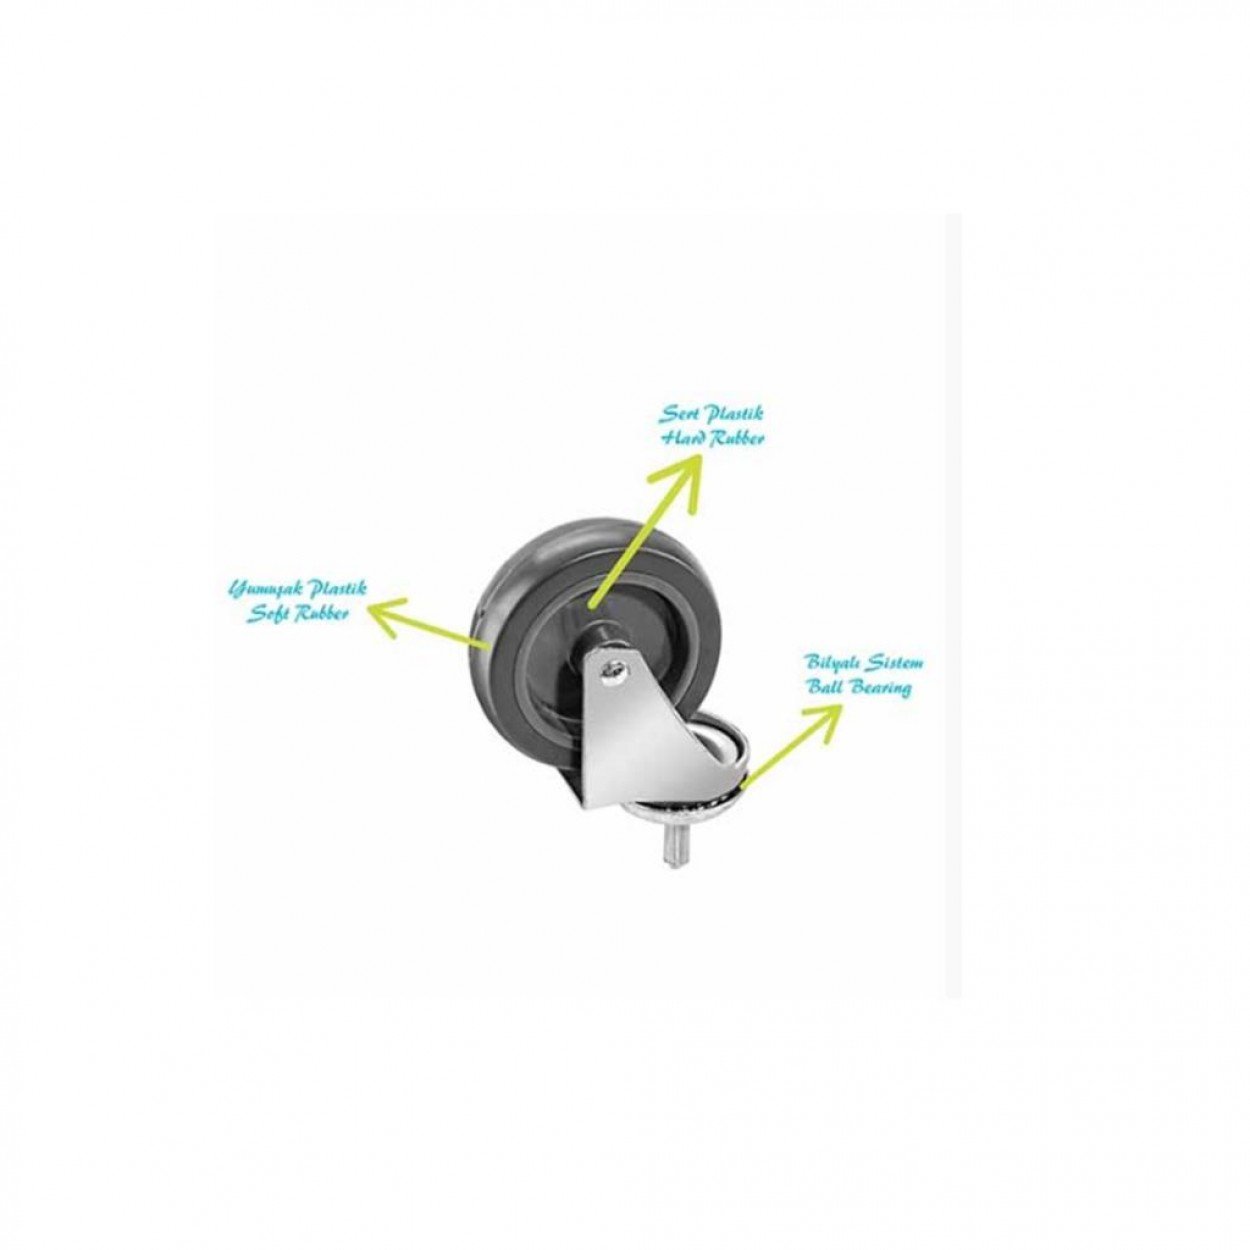 Euro Çift Kovalı Paspas Arabası Plastik Taşıyıcılı Plas.Presli Sepetli